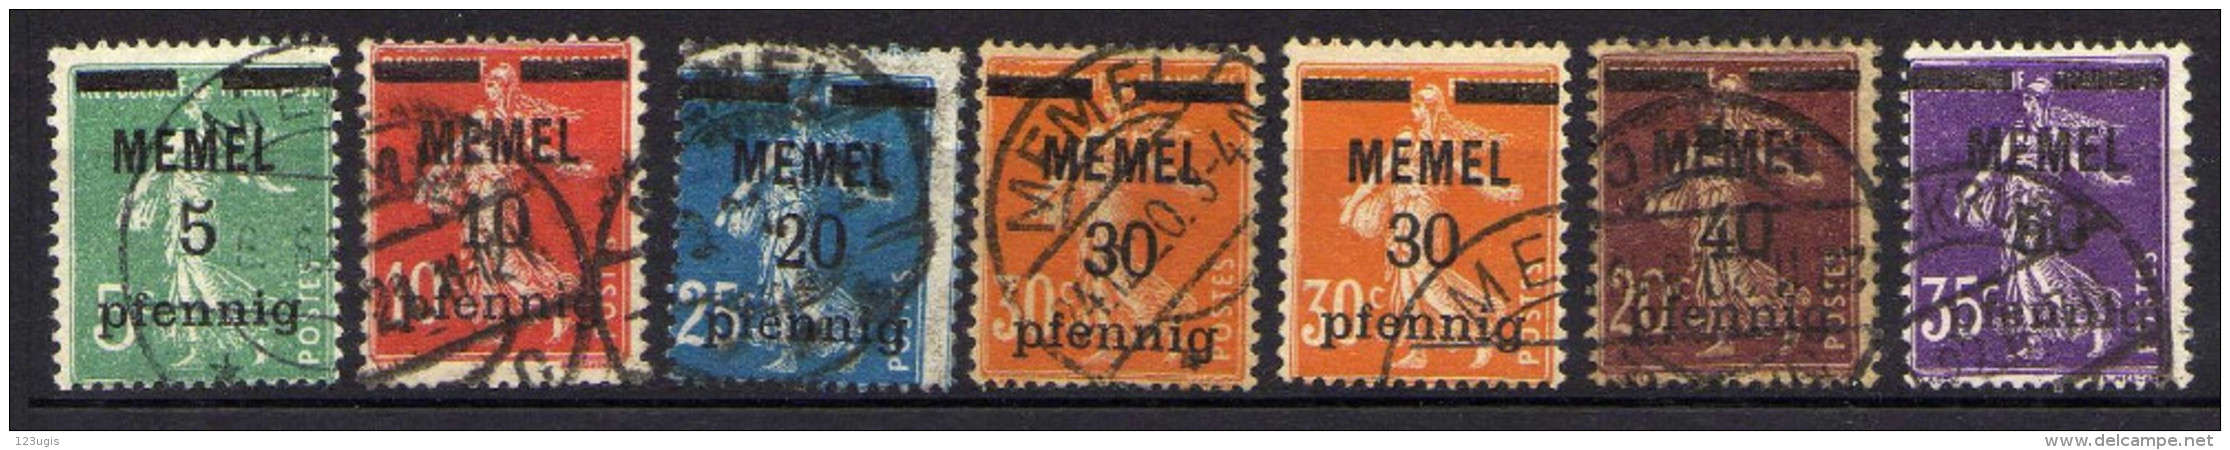 Memel 1920 Mi 18-23, Gestempelt (Mi 21 X + Y) [301016XIII] - Memelgebiet